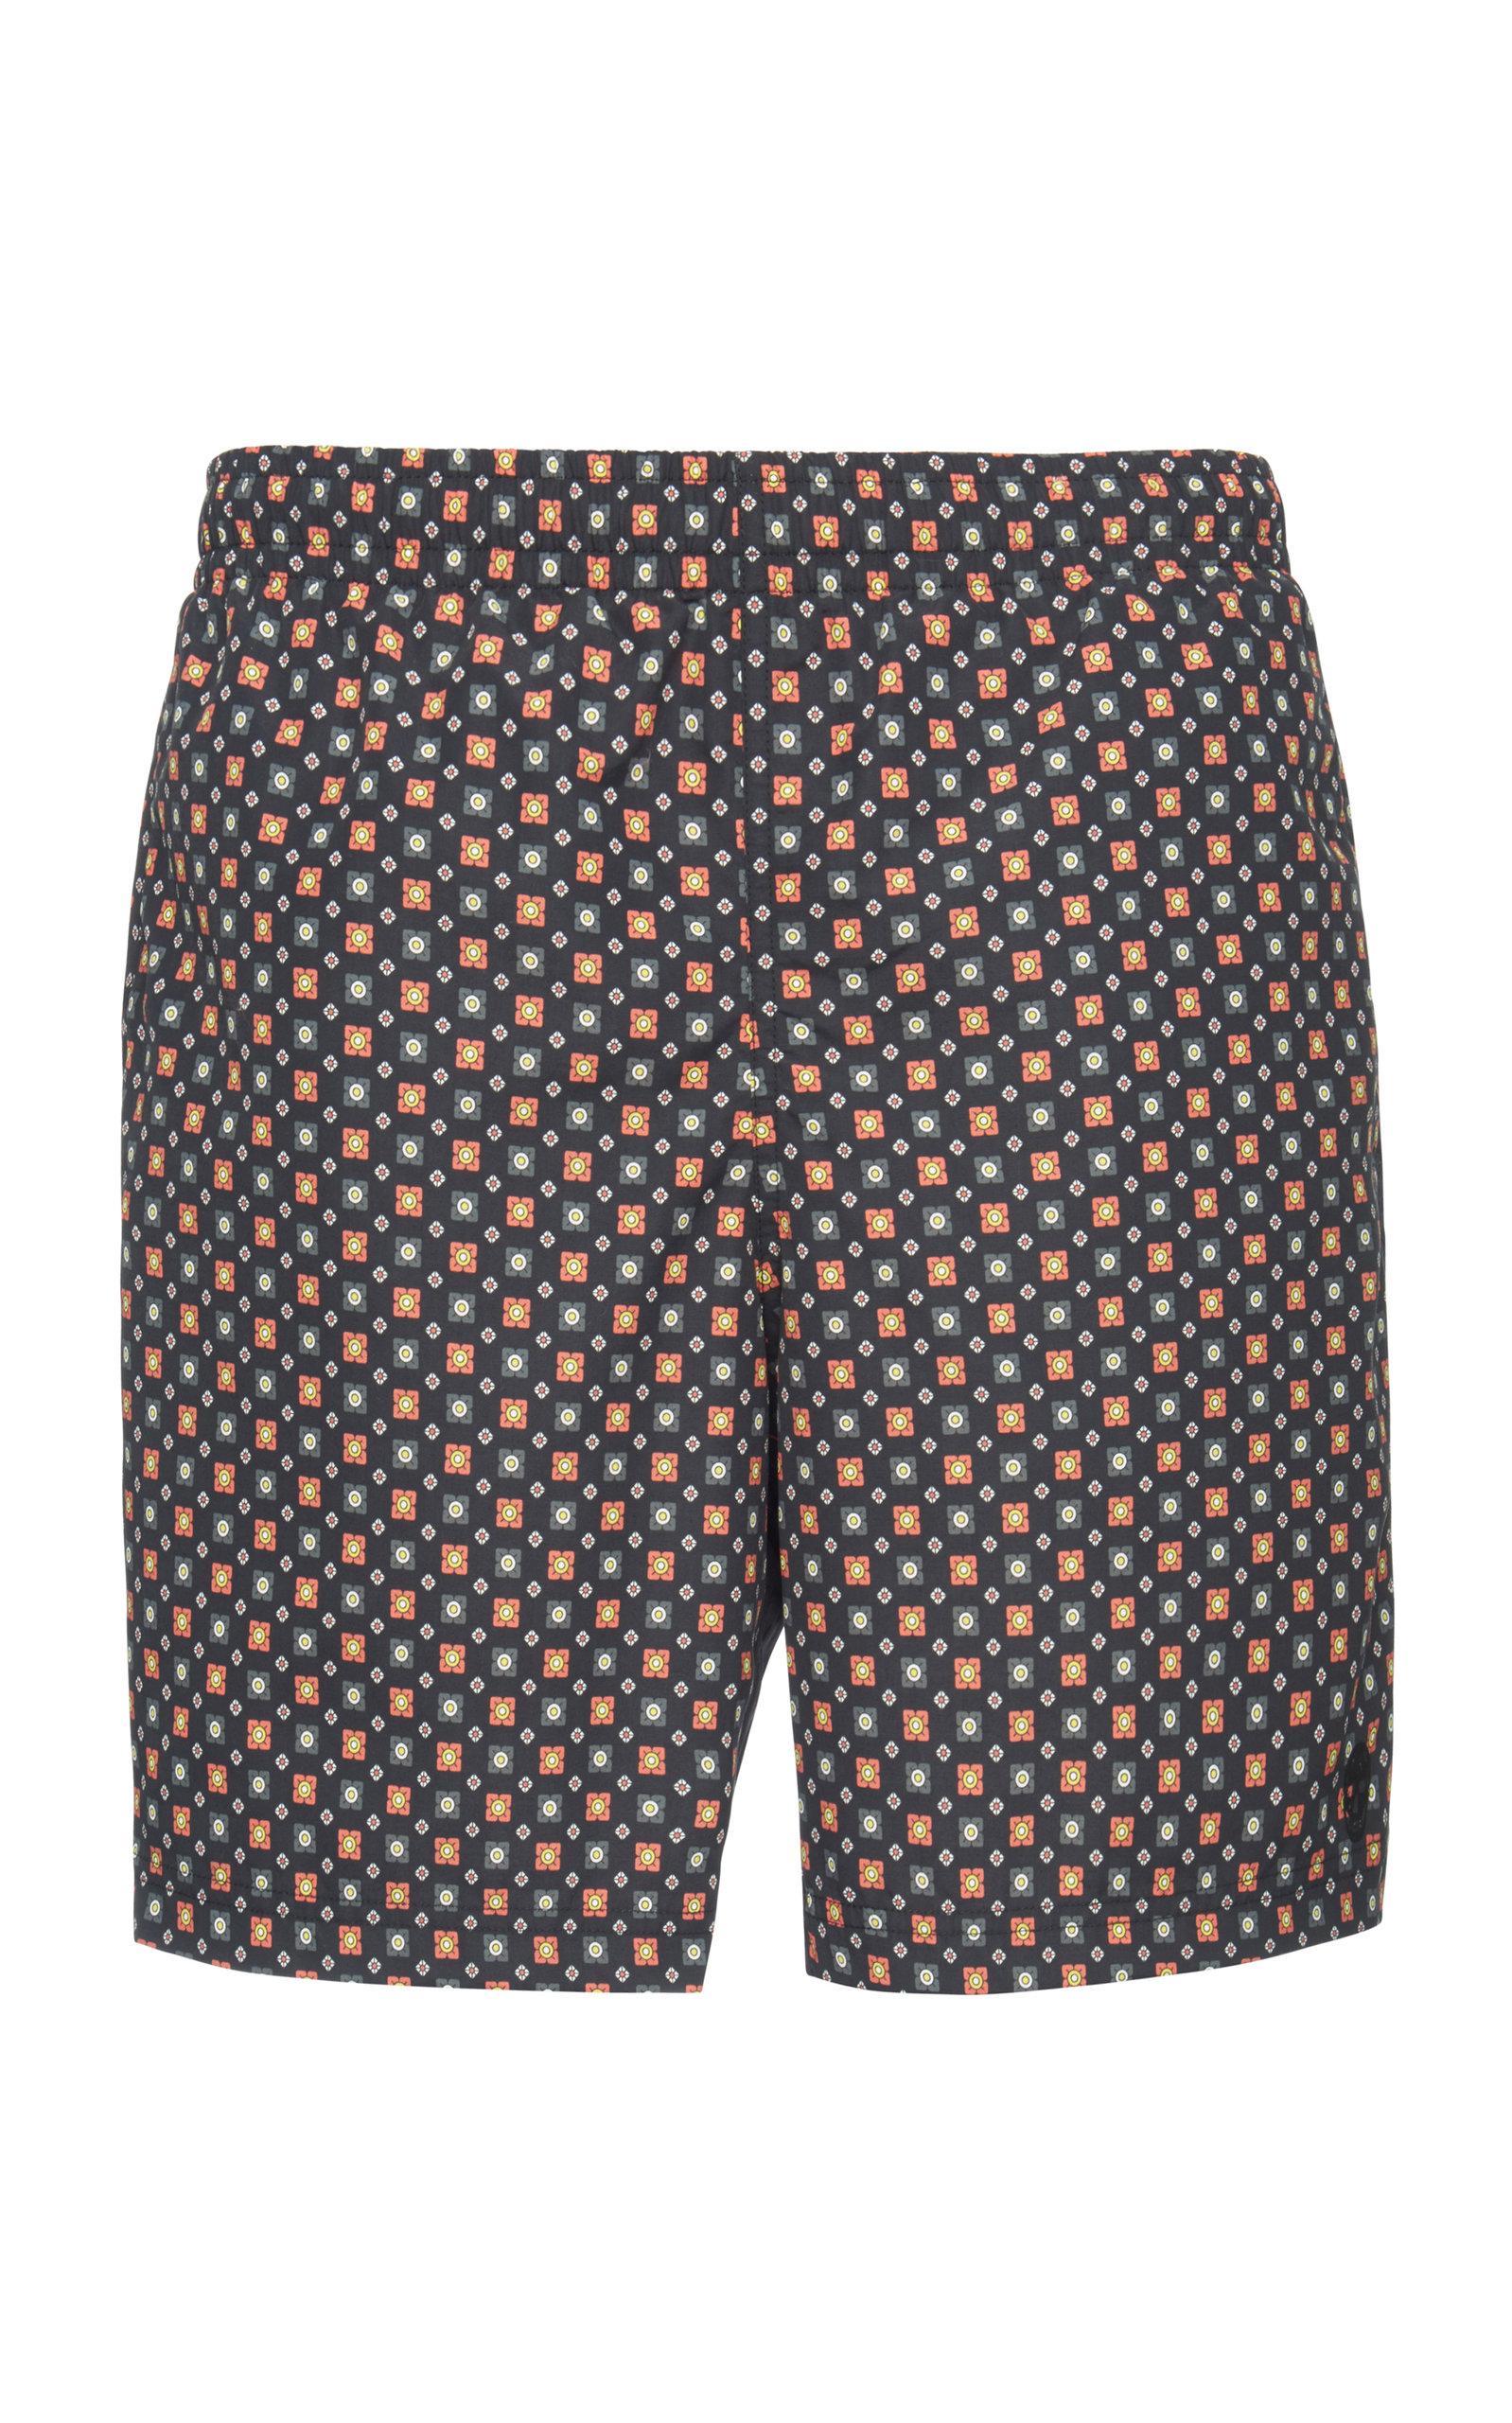 476670362d Lyst - Alexander McQueen Floral-print Swim Shorts in Blue for Men ...